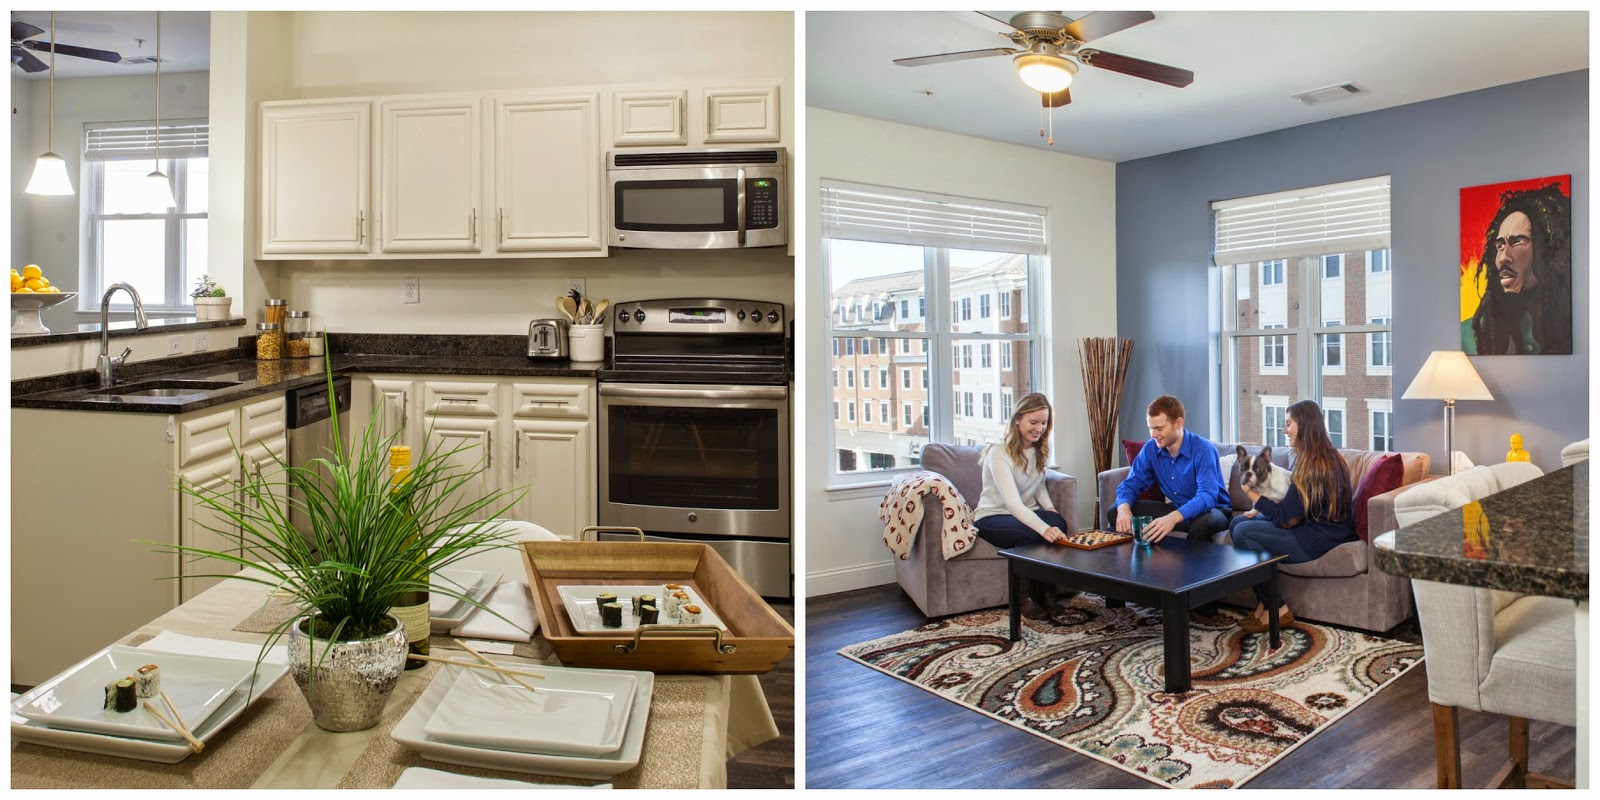 Charter Oak Apartments Uconn Address - Apartment ...